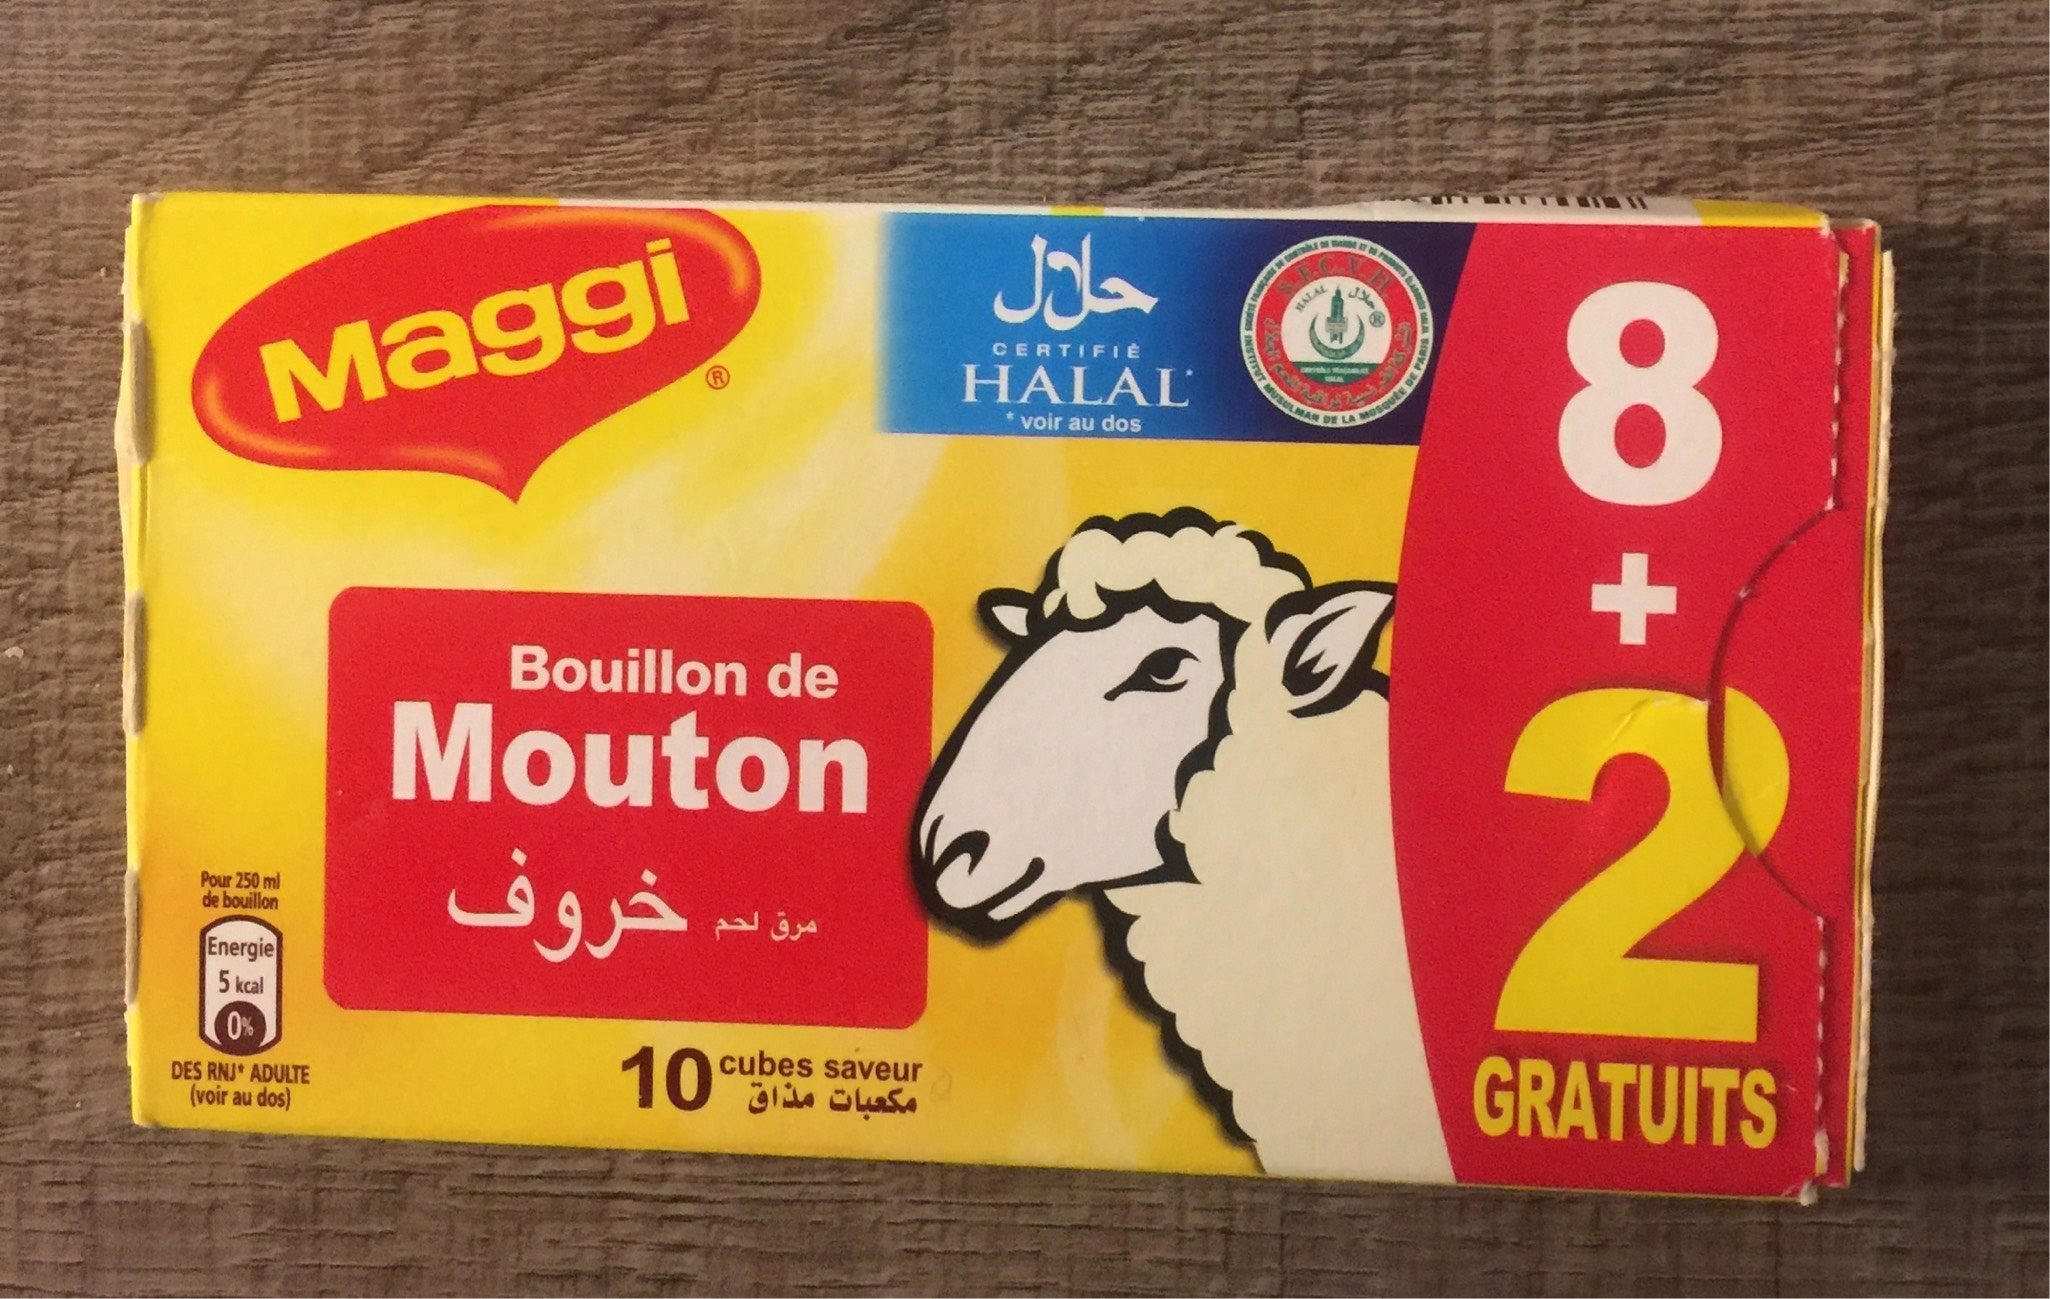 Bouillon Cube Maggi Mouton Halal - Product - fr